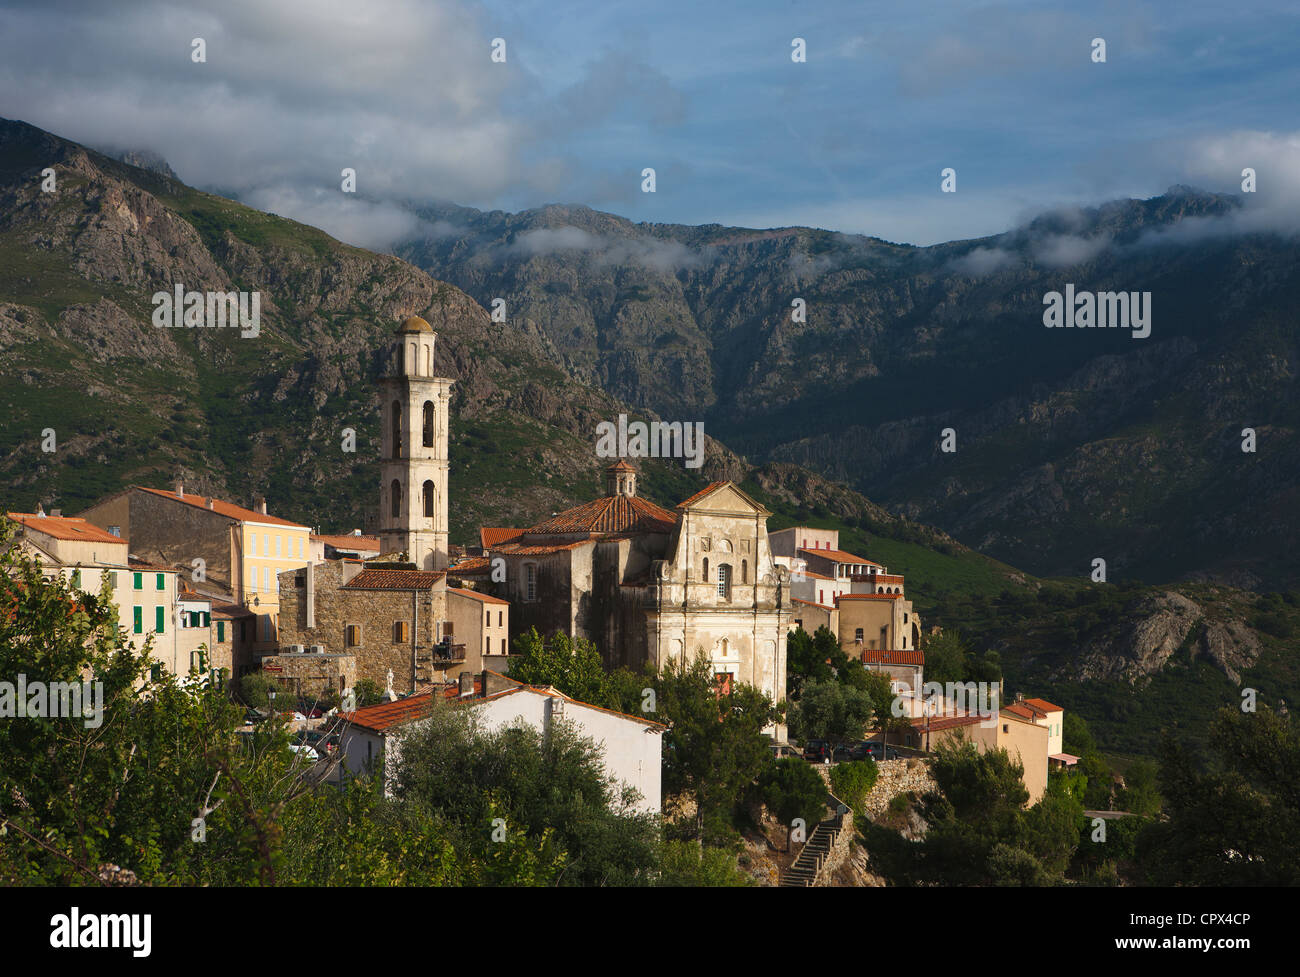 the village of Montemaggiore on the Route des Artisans, la Balagne, Corsica, France - Stock Image